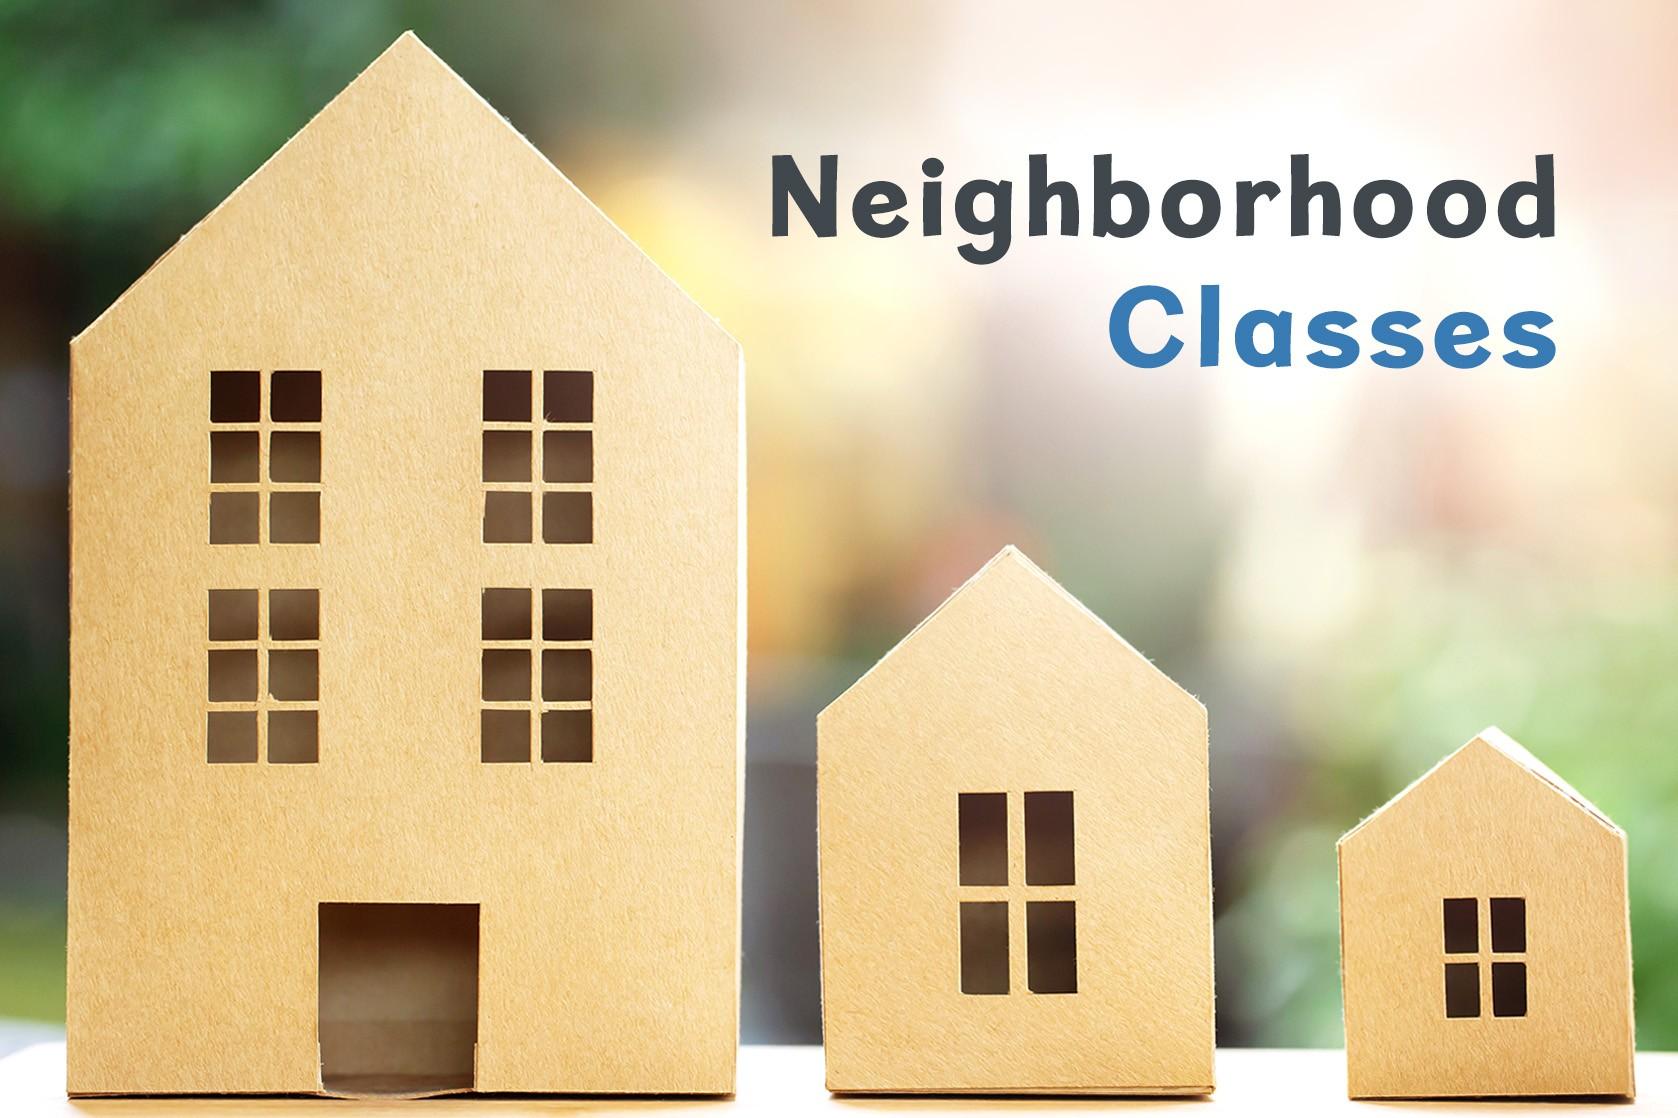 Rental Real Estate Property Classification - A, B, C, C Neighborhoods